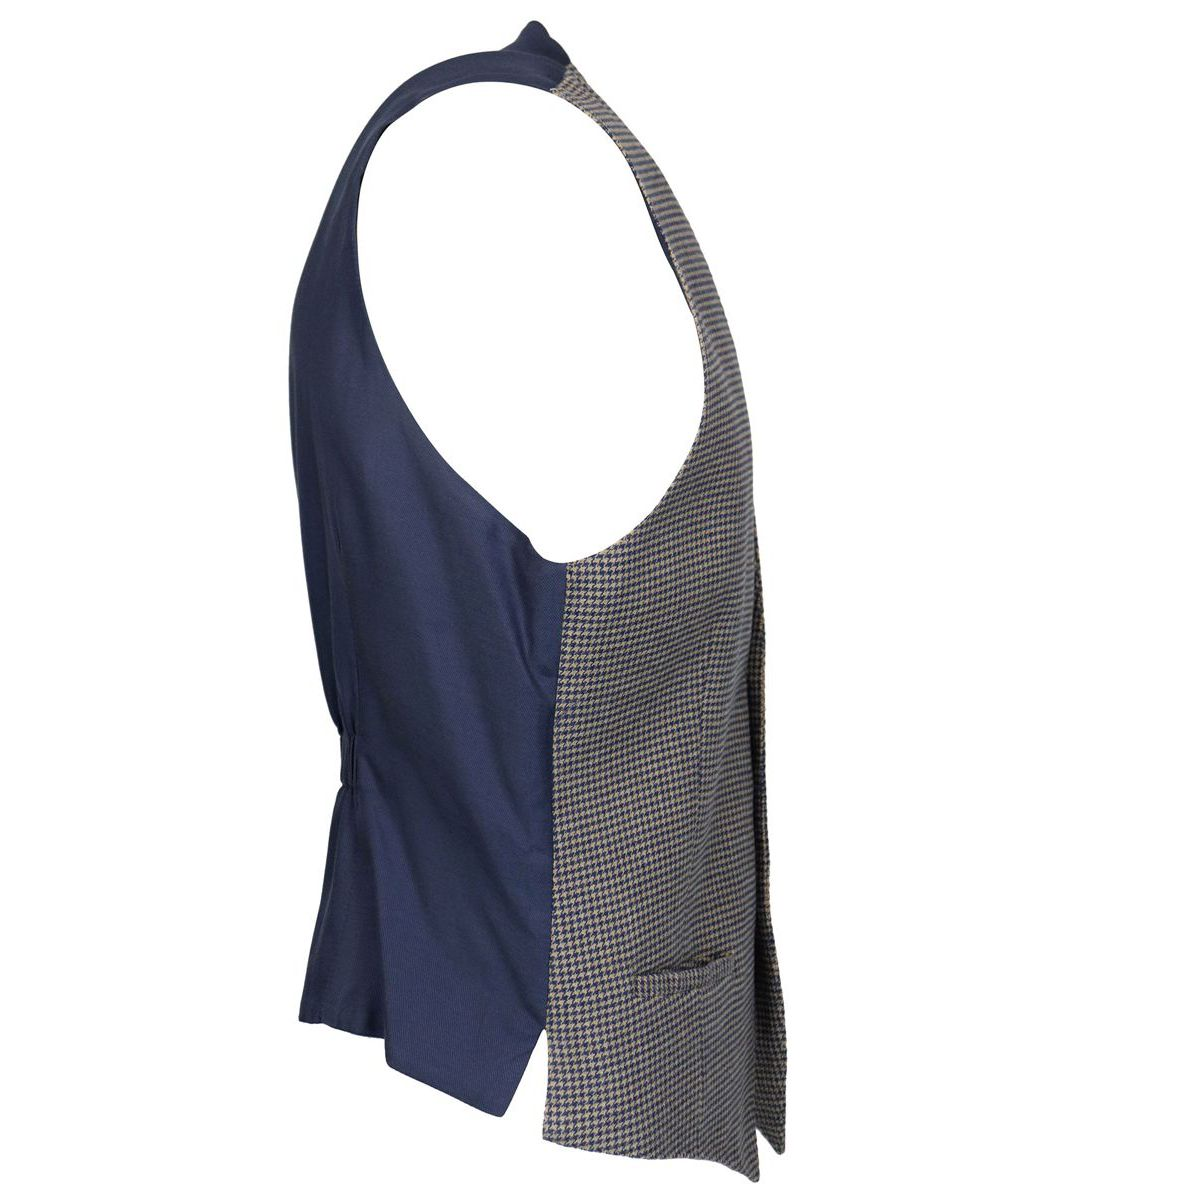 Houndstooth patterned cotton vest Tortora L.B.M. 1911